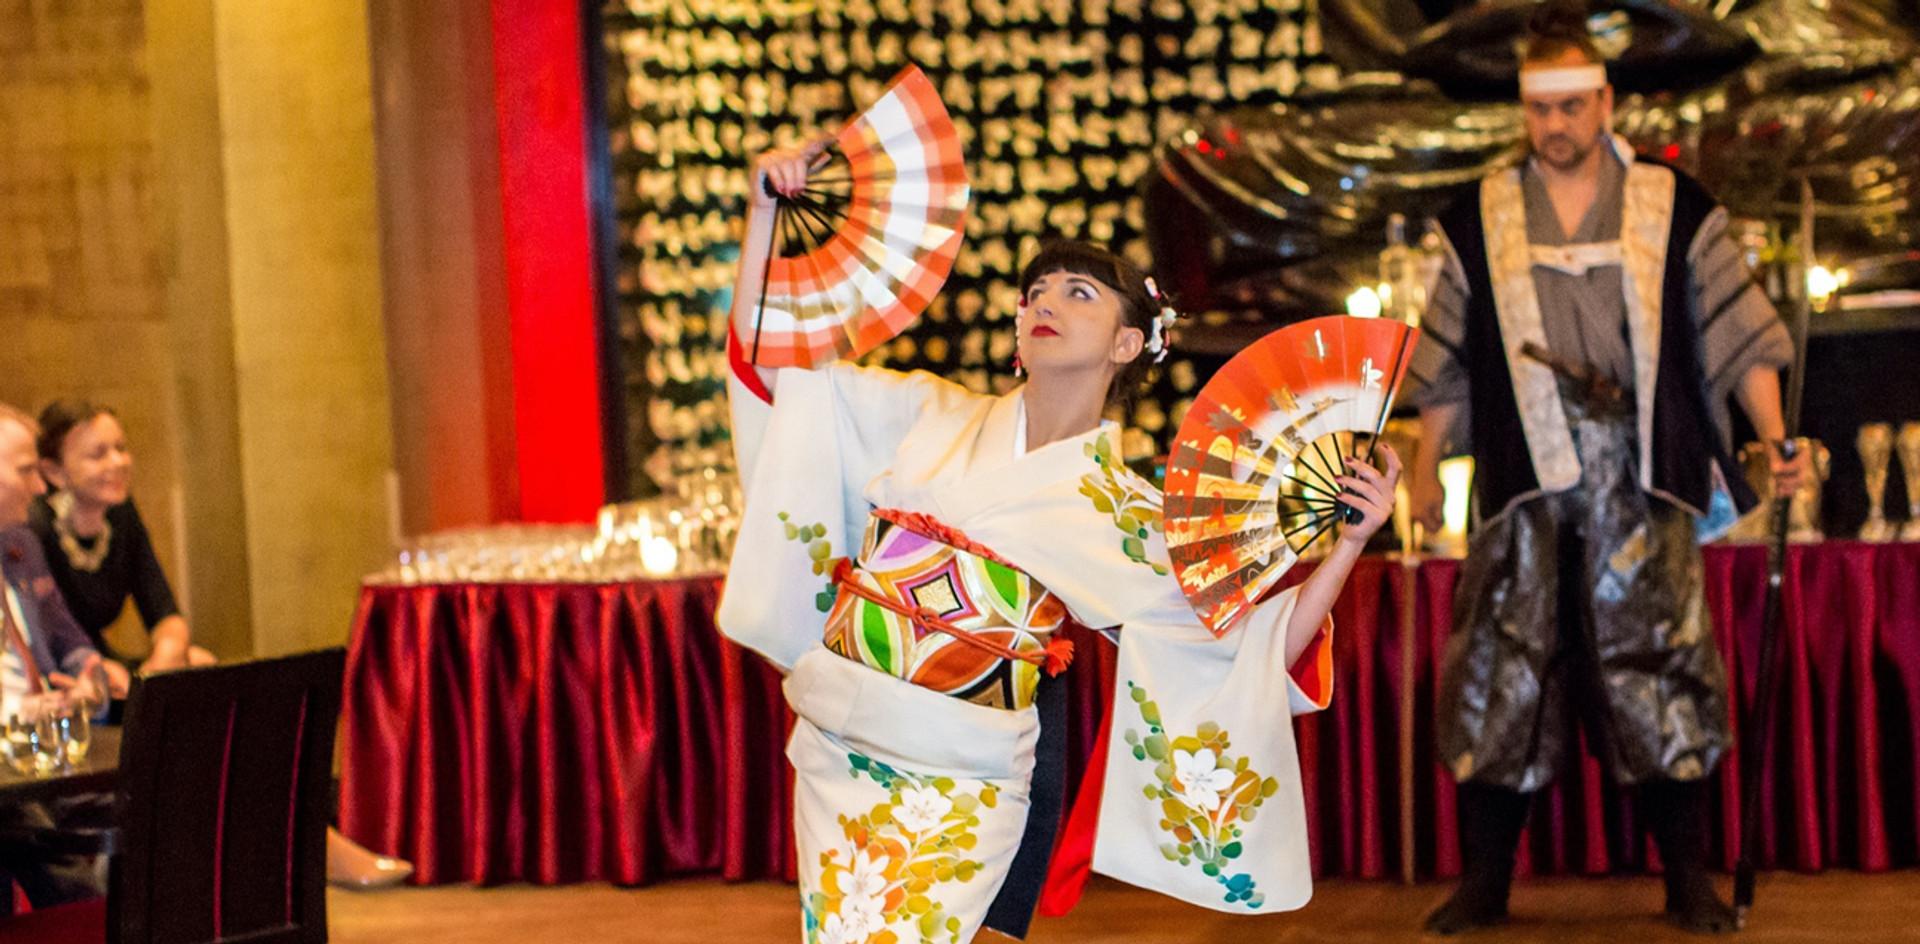 Kimono fashion shows and presetations